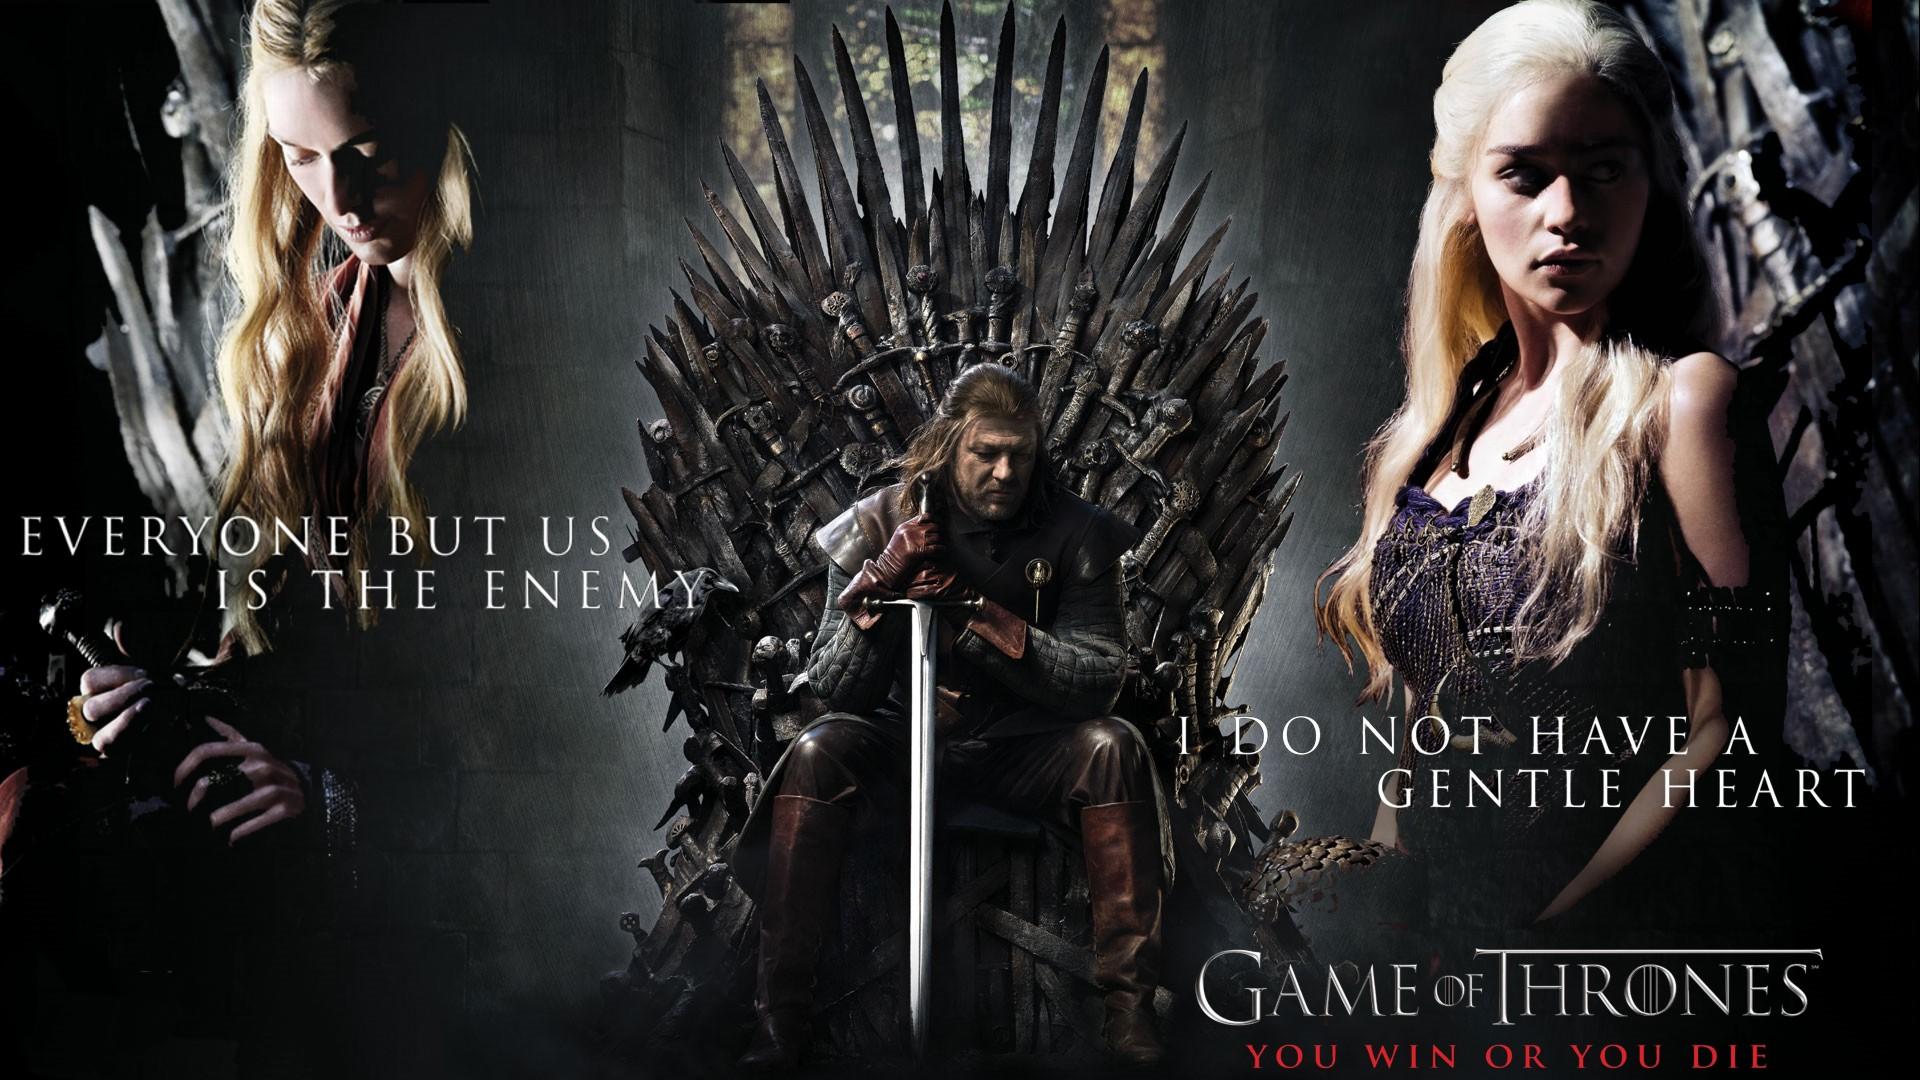 Game Of Thrones wallpaper   843293 1920x1080